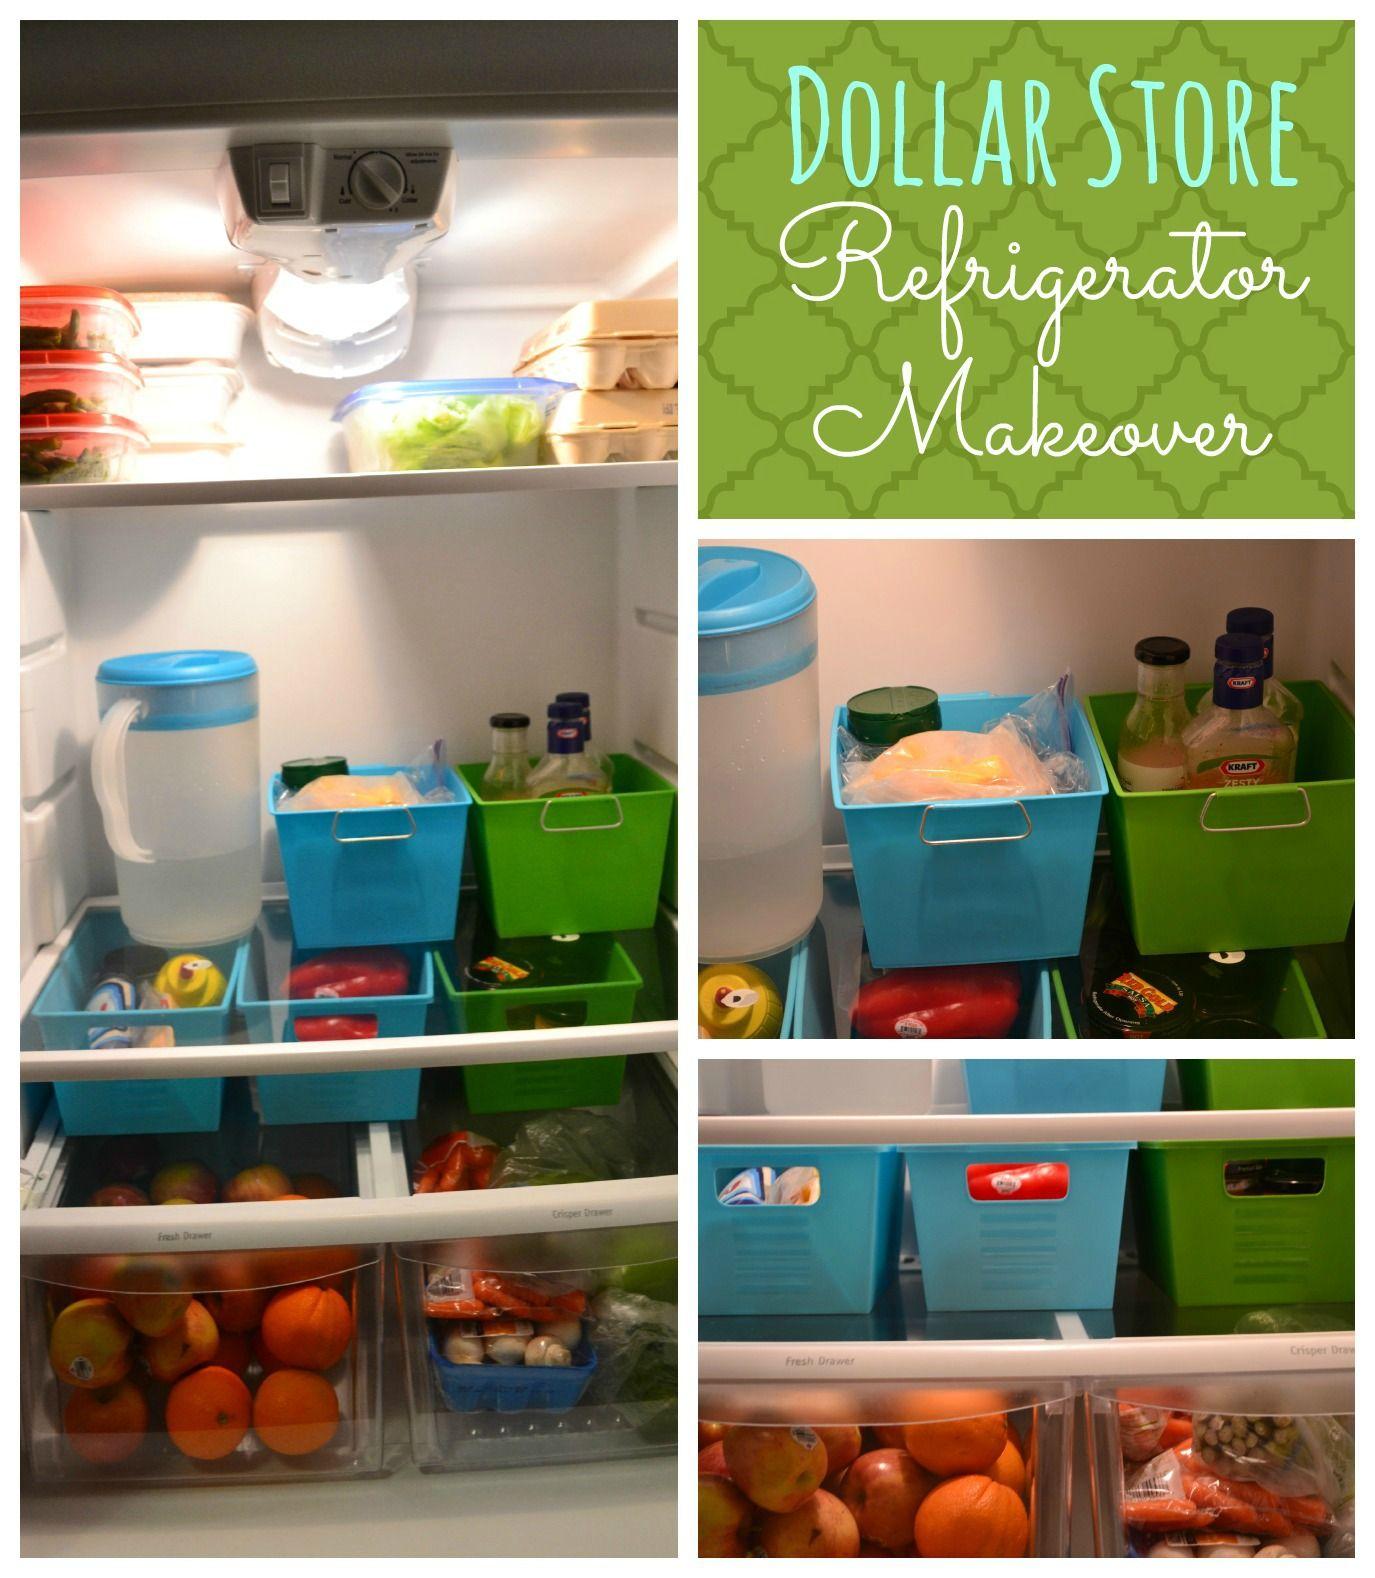 Kitchen Organization From The Dollar Store: Best 25+ Dollar Tree Organization Ideas On Pinterest